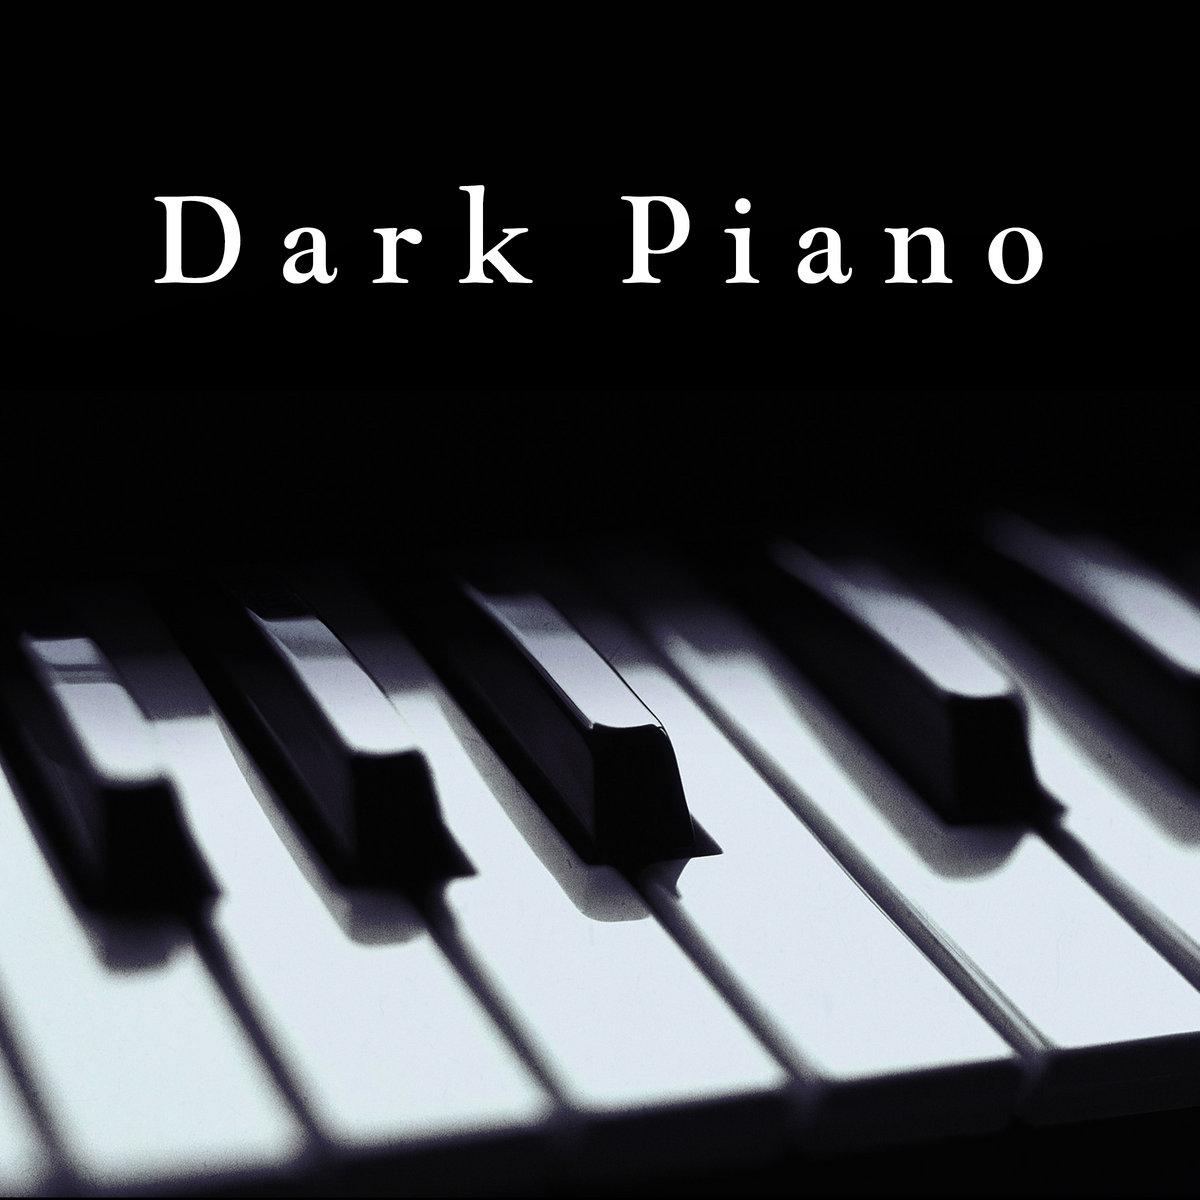 Beethoven Moonlight Sonata | Thematic Pianos